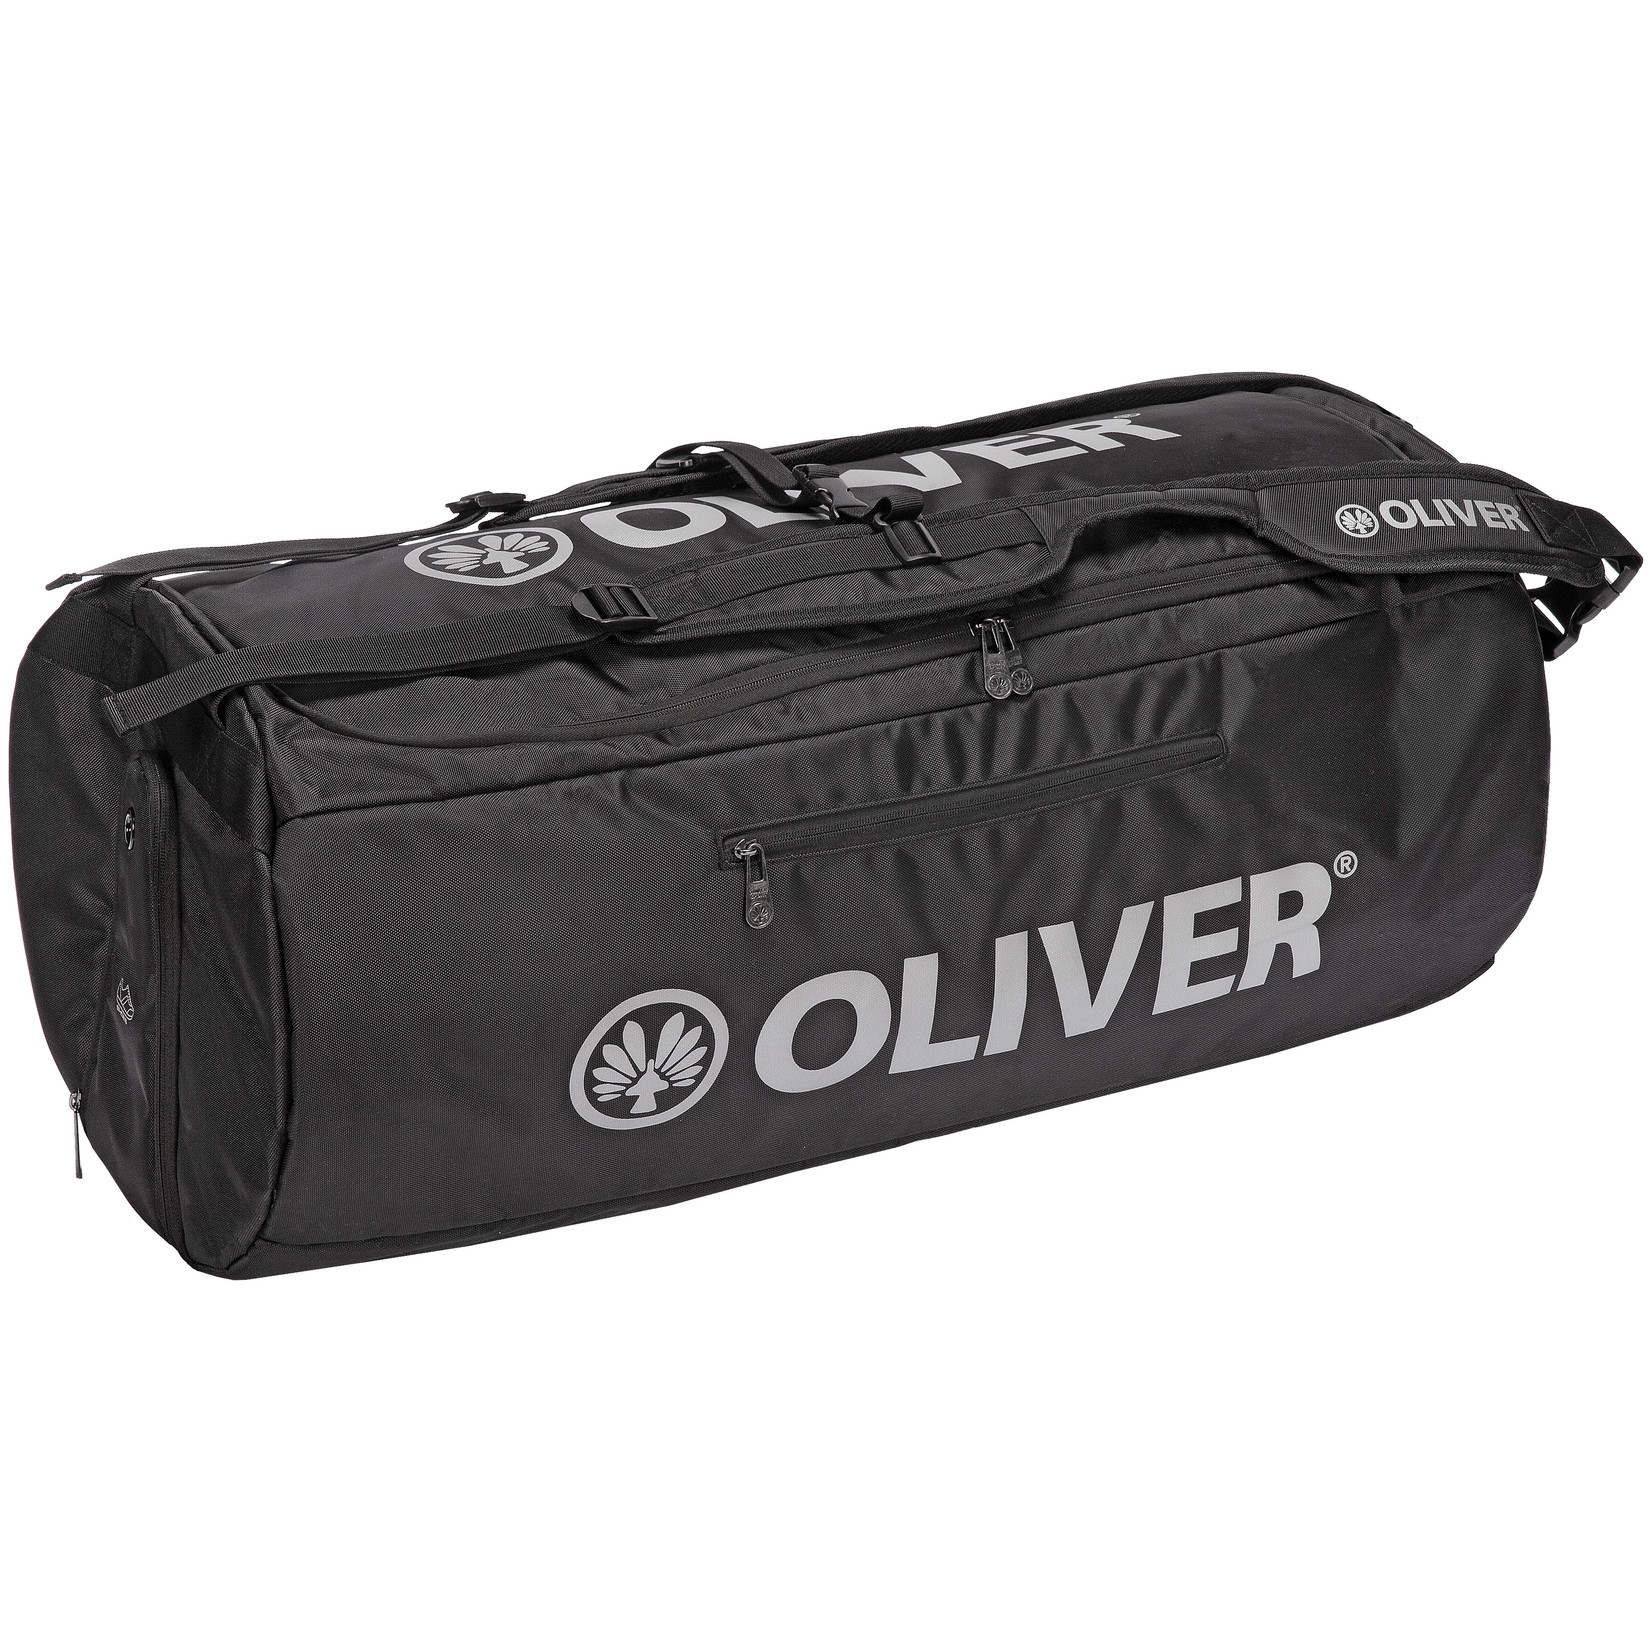 Oliver Square bag - Toernooi tas